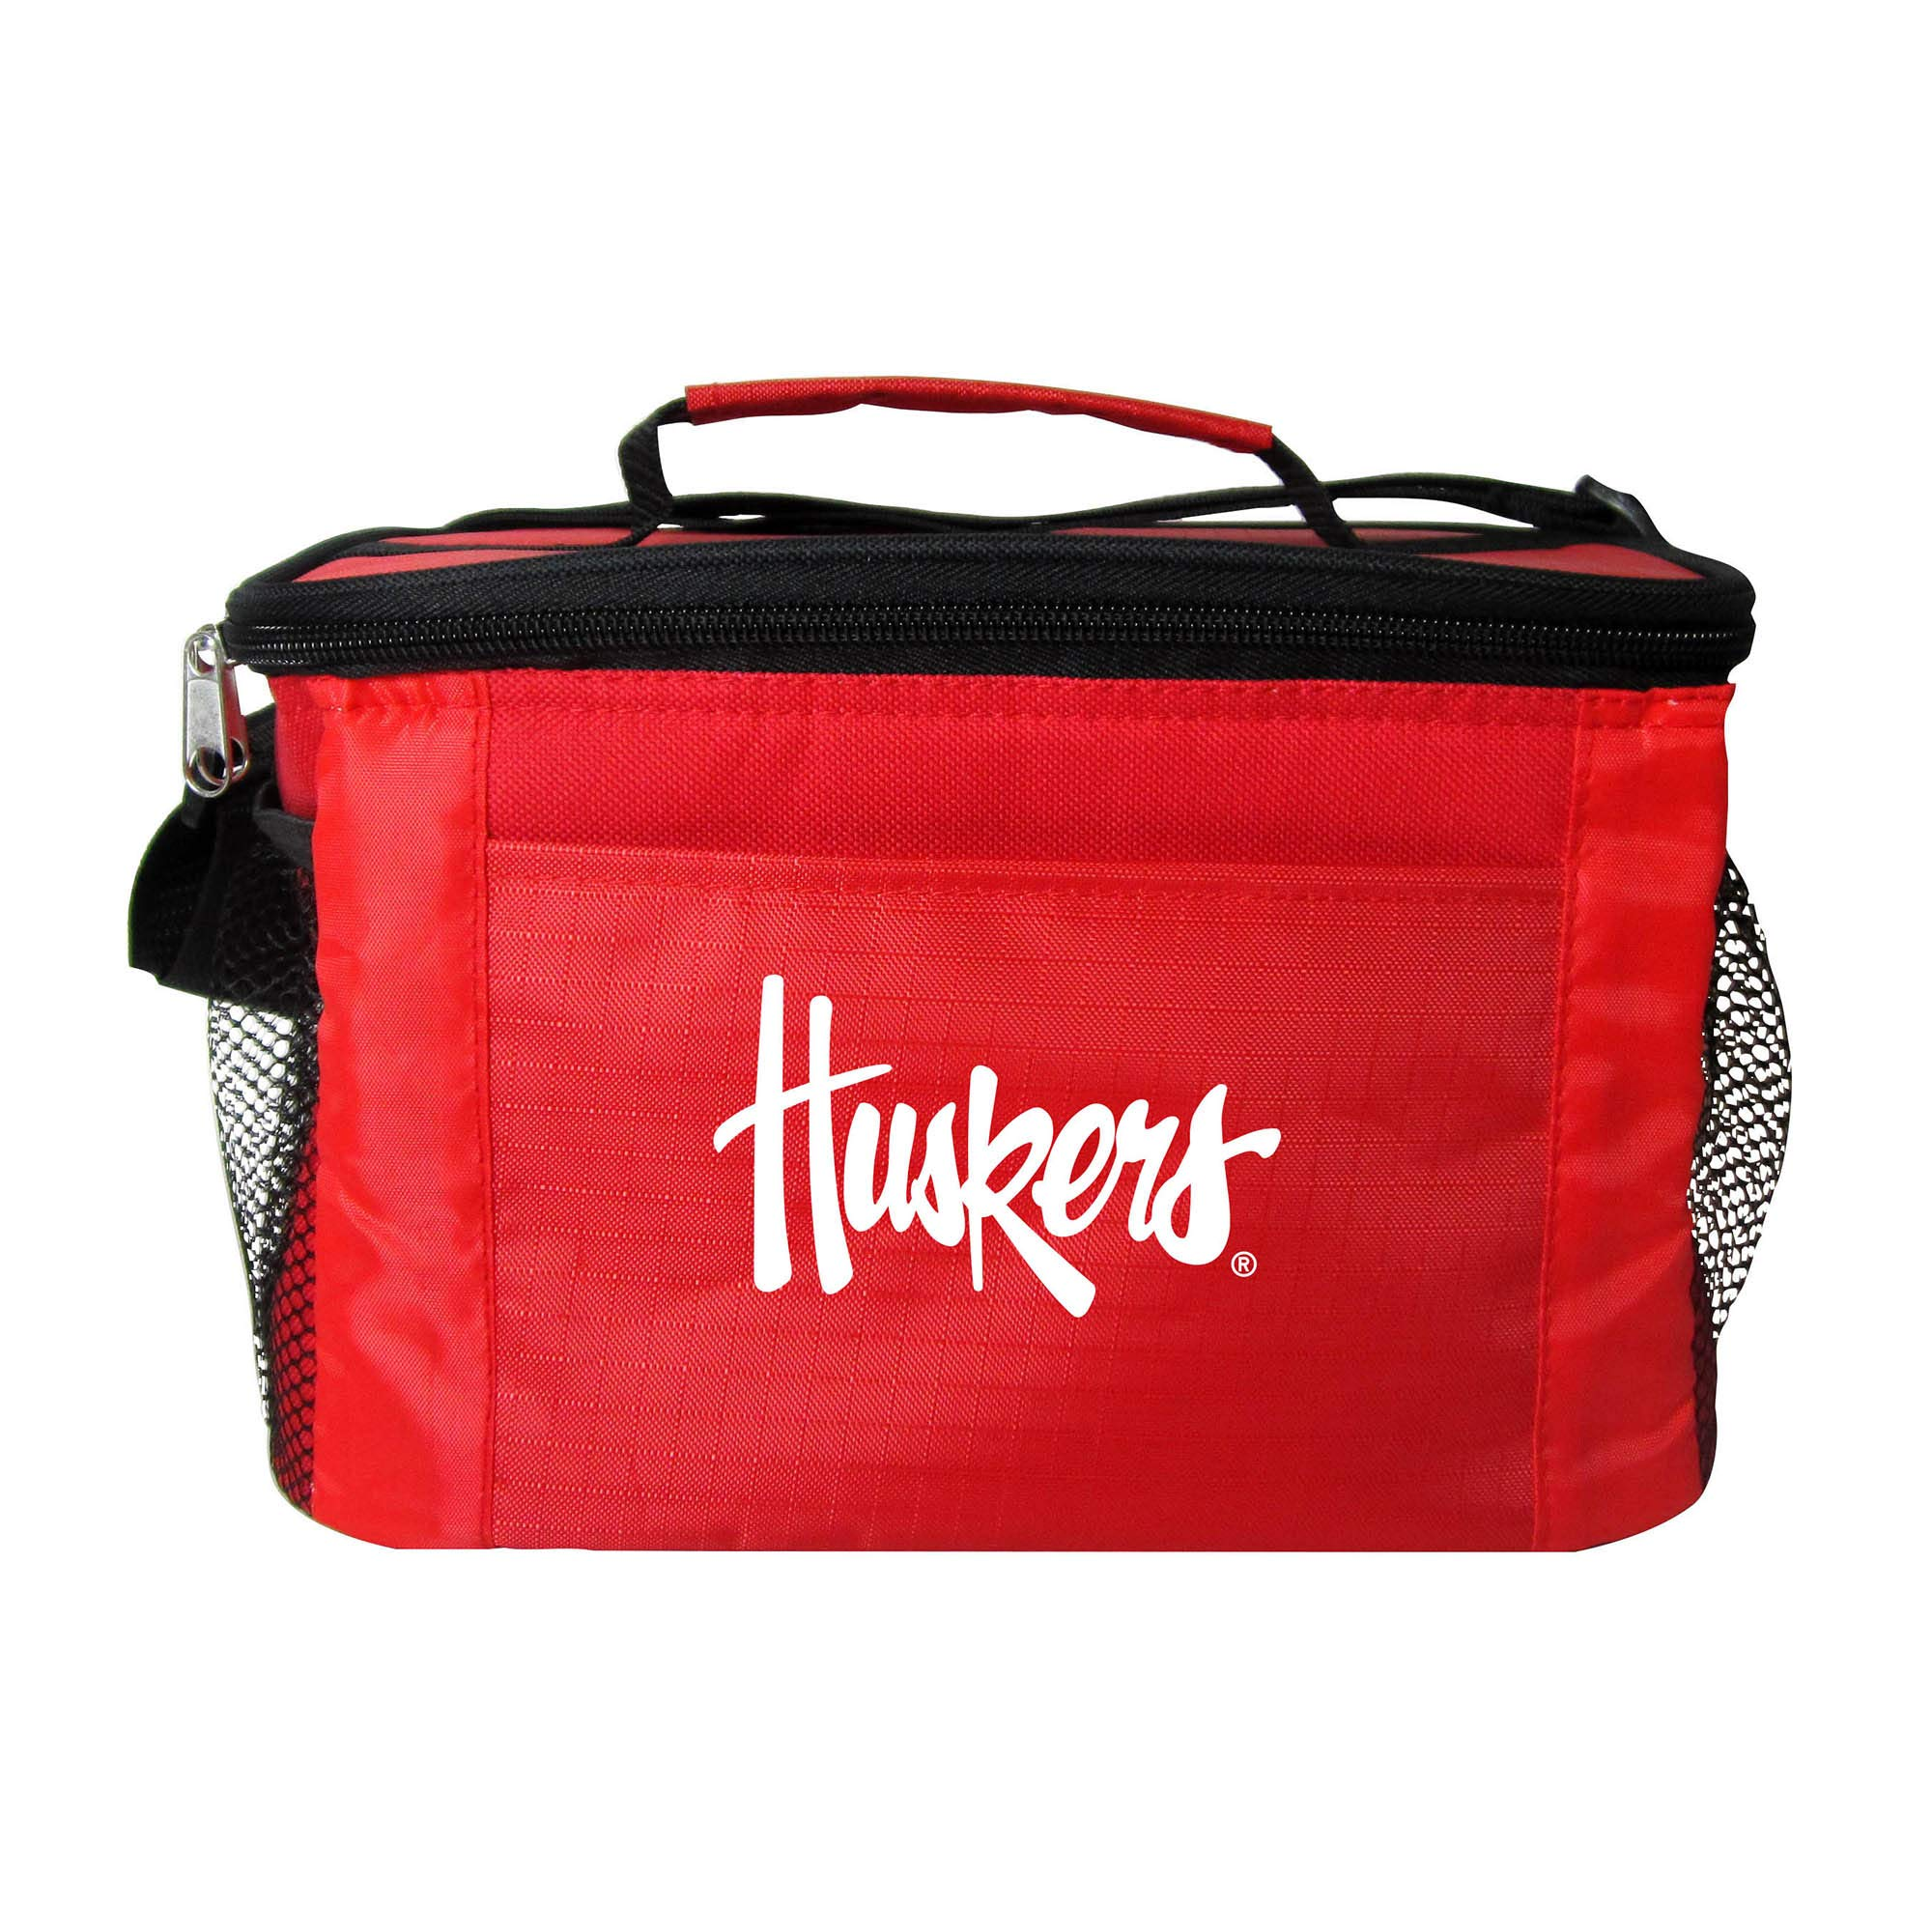 NCAA Nebraska Cornhuskers Team Logo 6 Can Cooler Bag or Lunch Box - Red